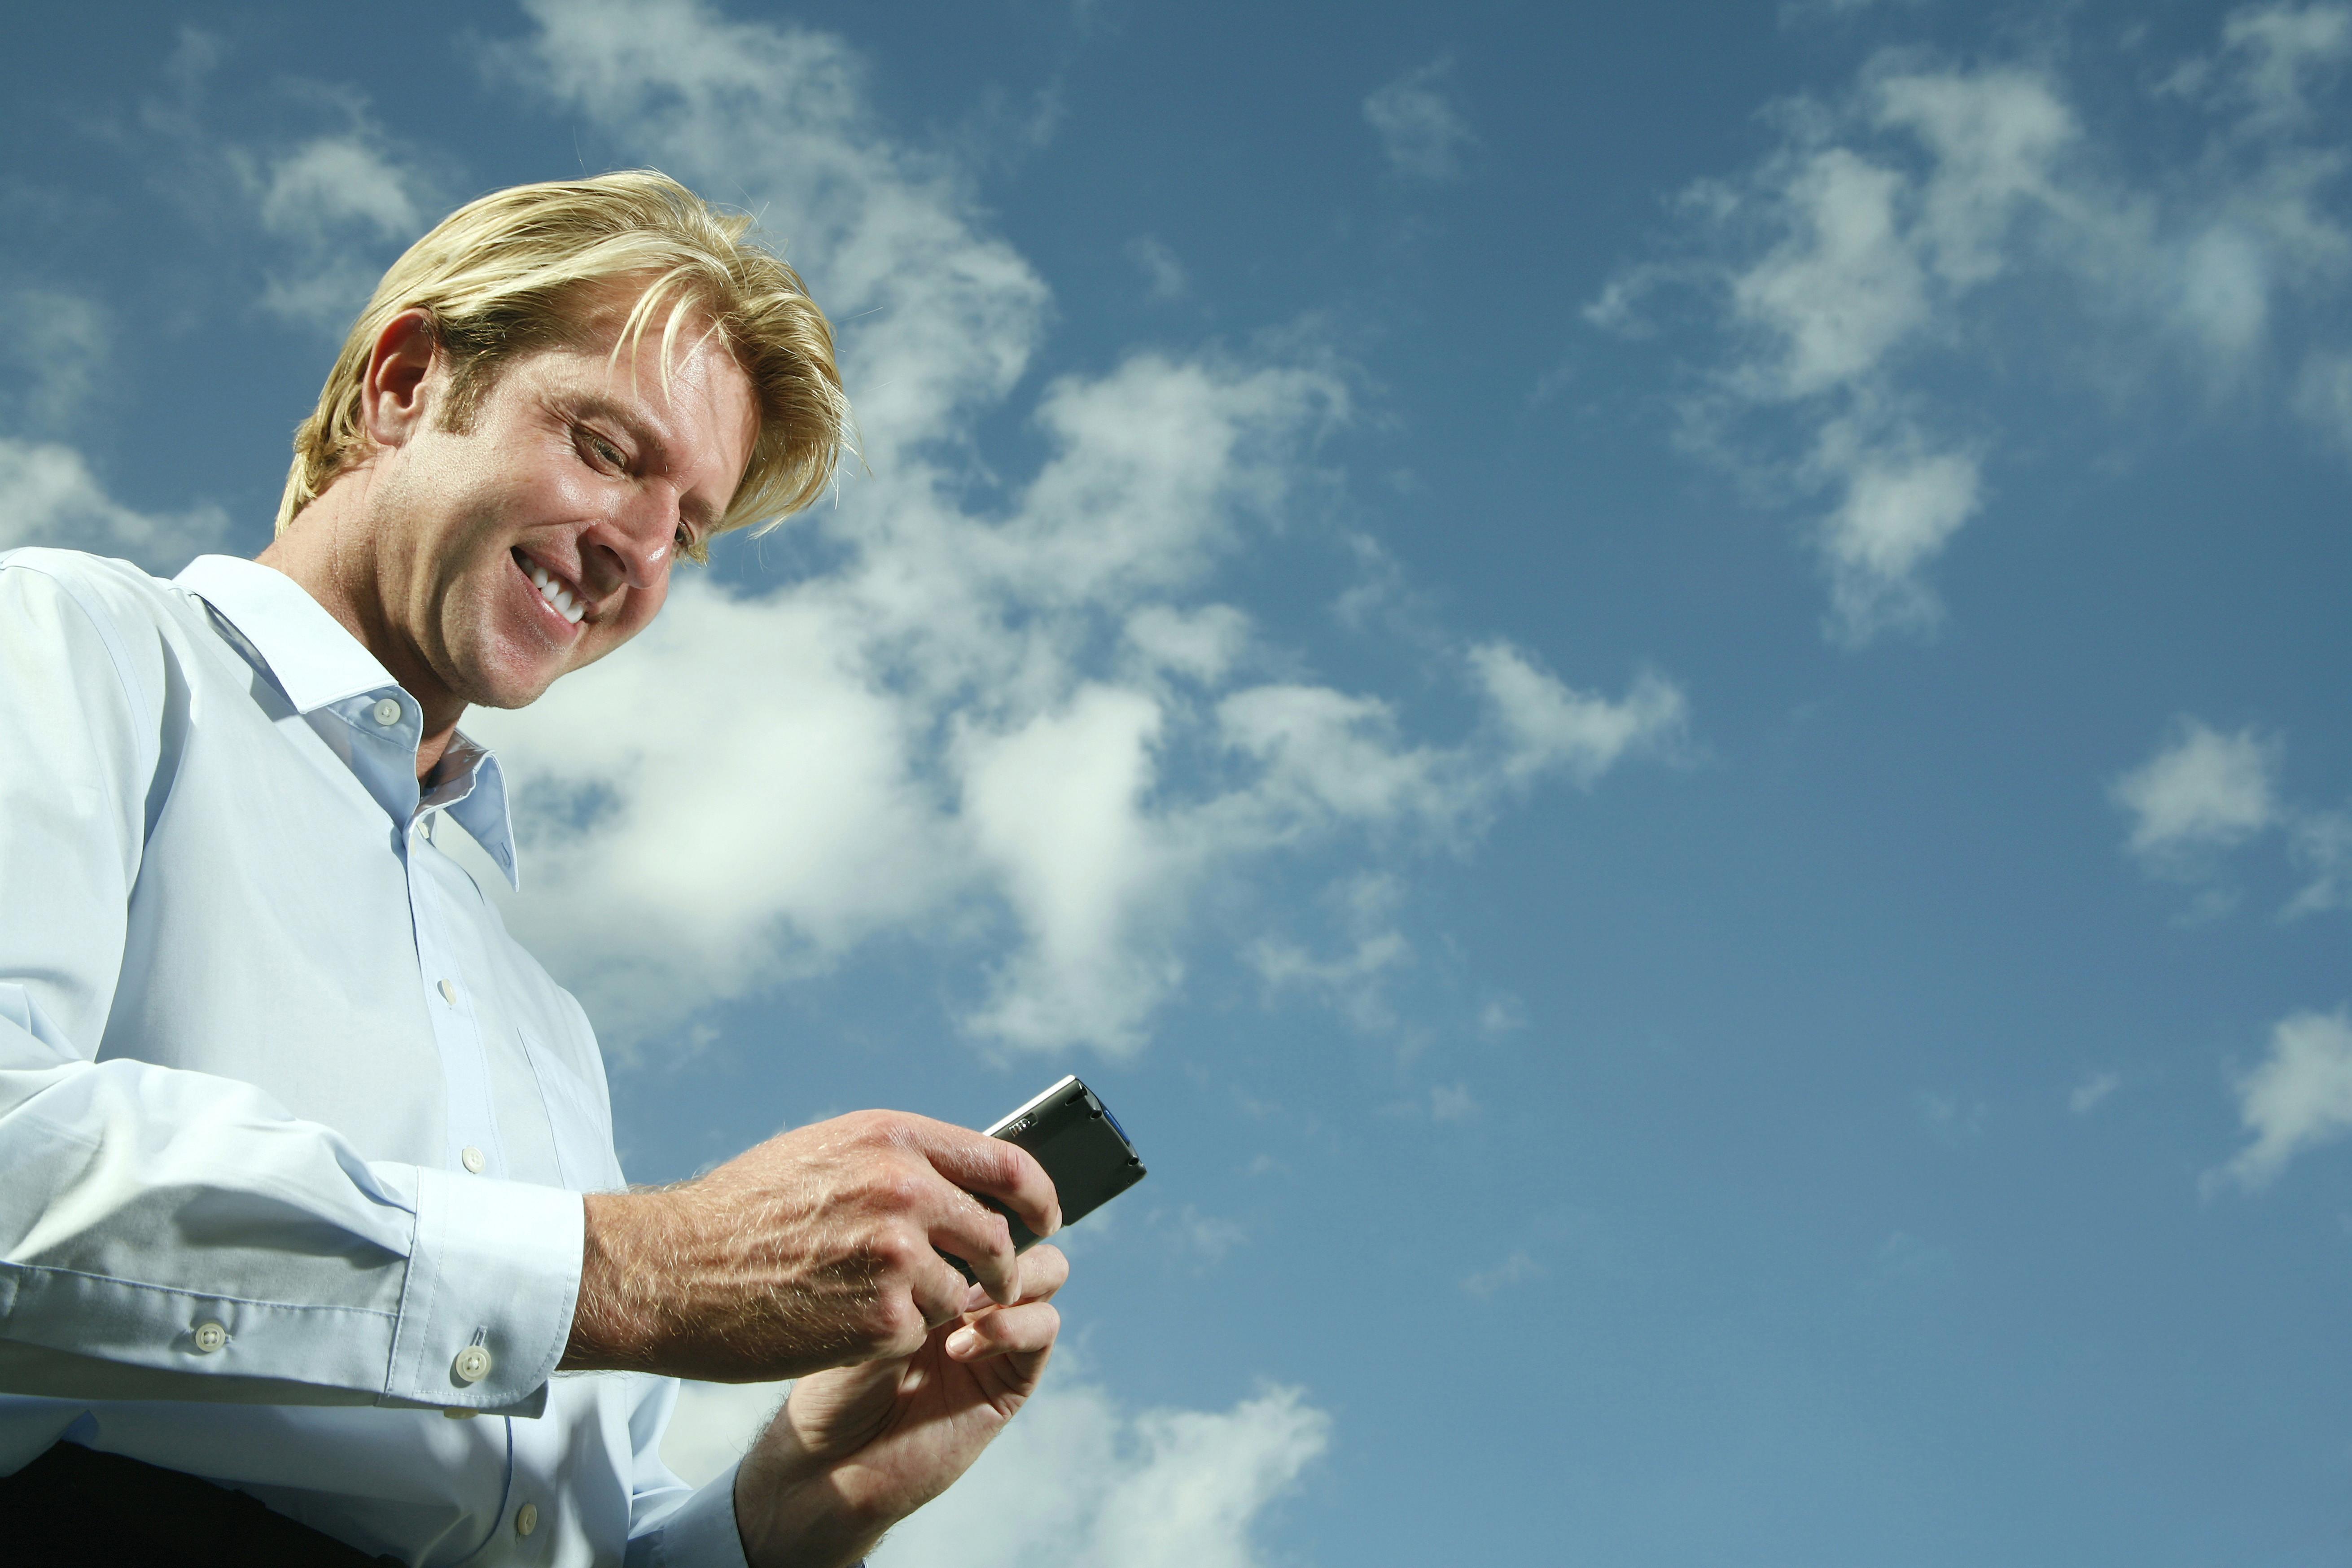 Mobile SIM Card